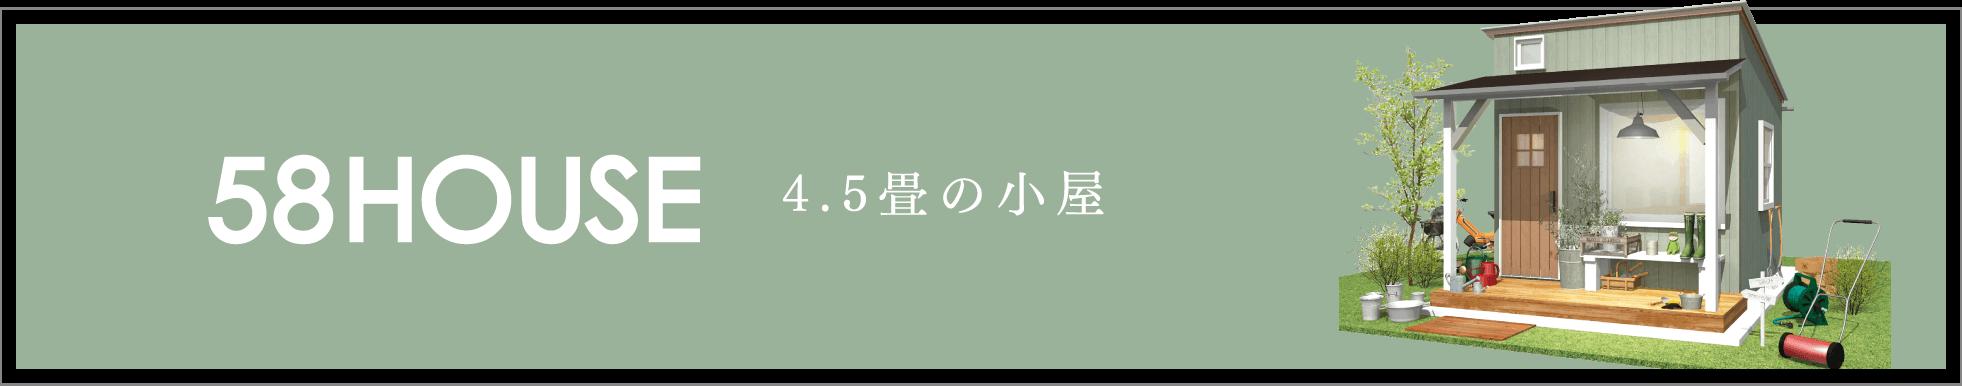 58HOUSE 4.5畳の小屋